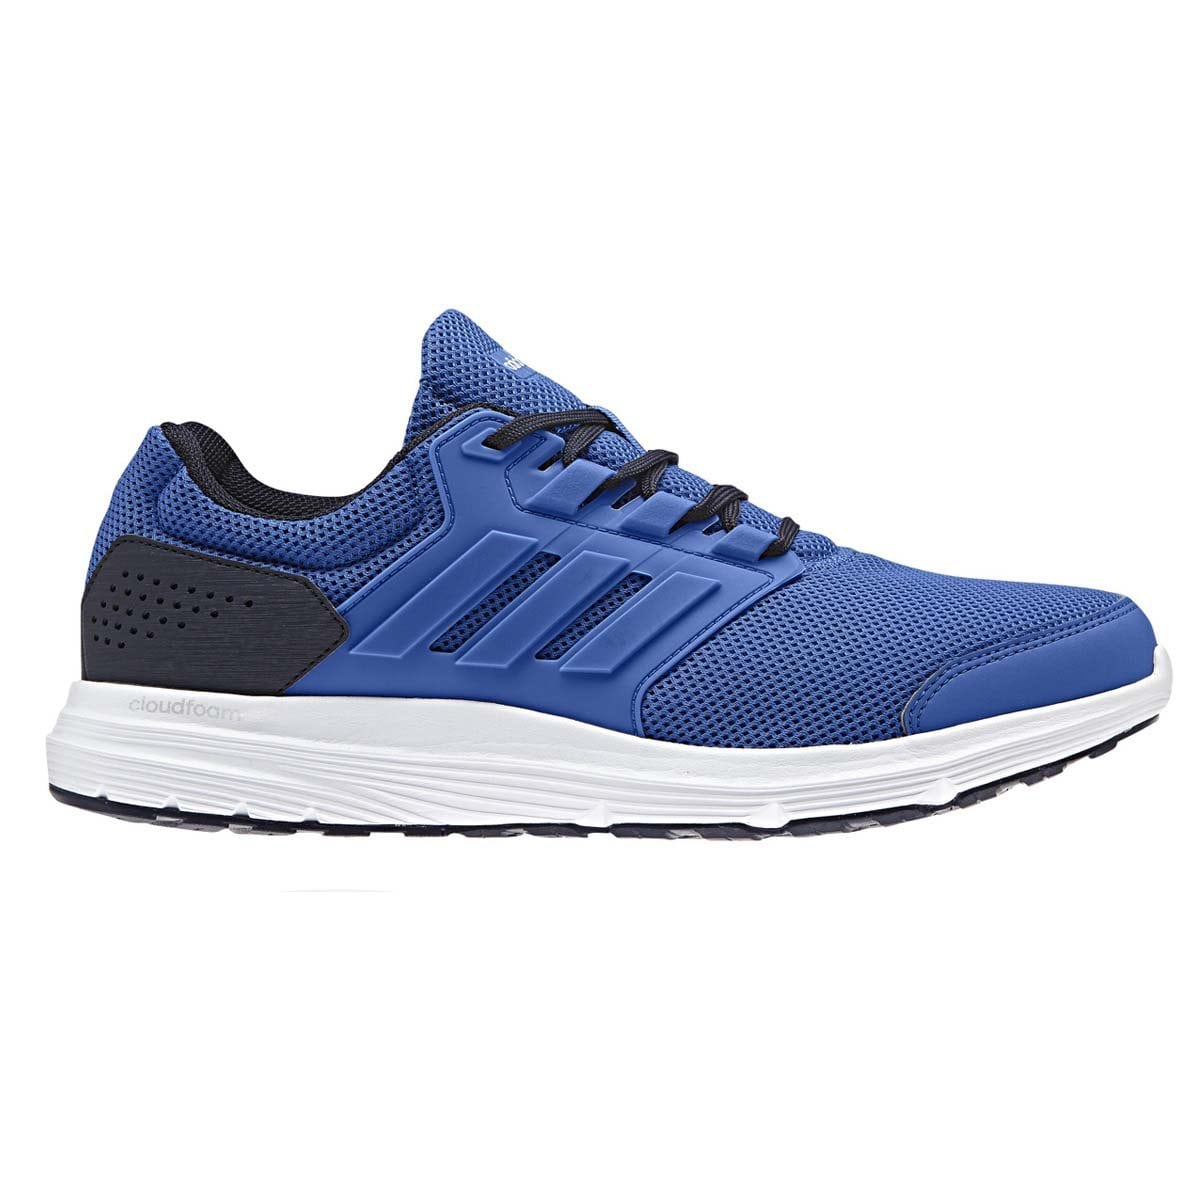 Tenis Running Adidas - Caballero